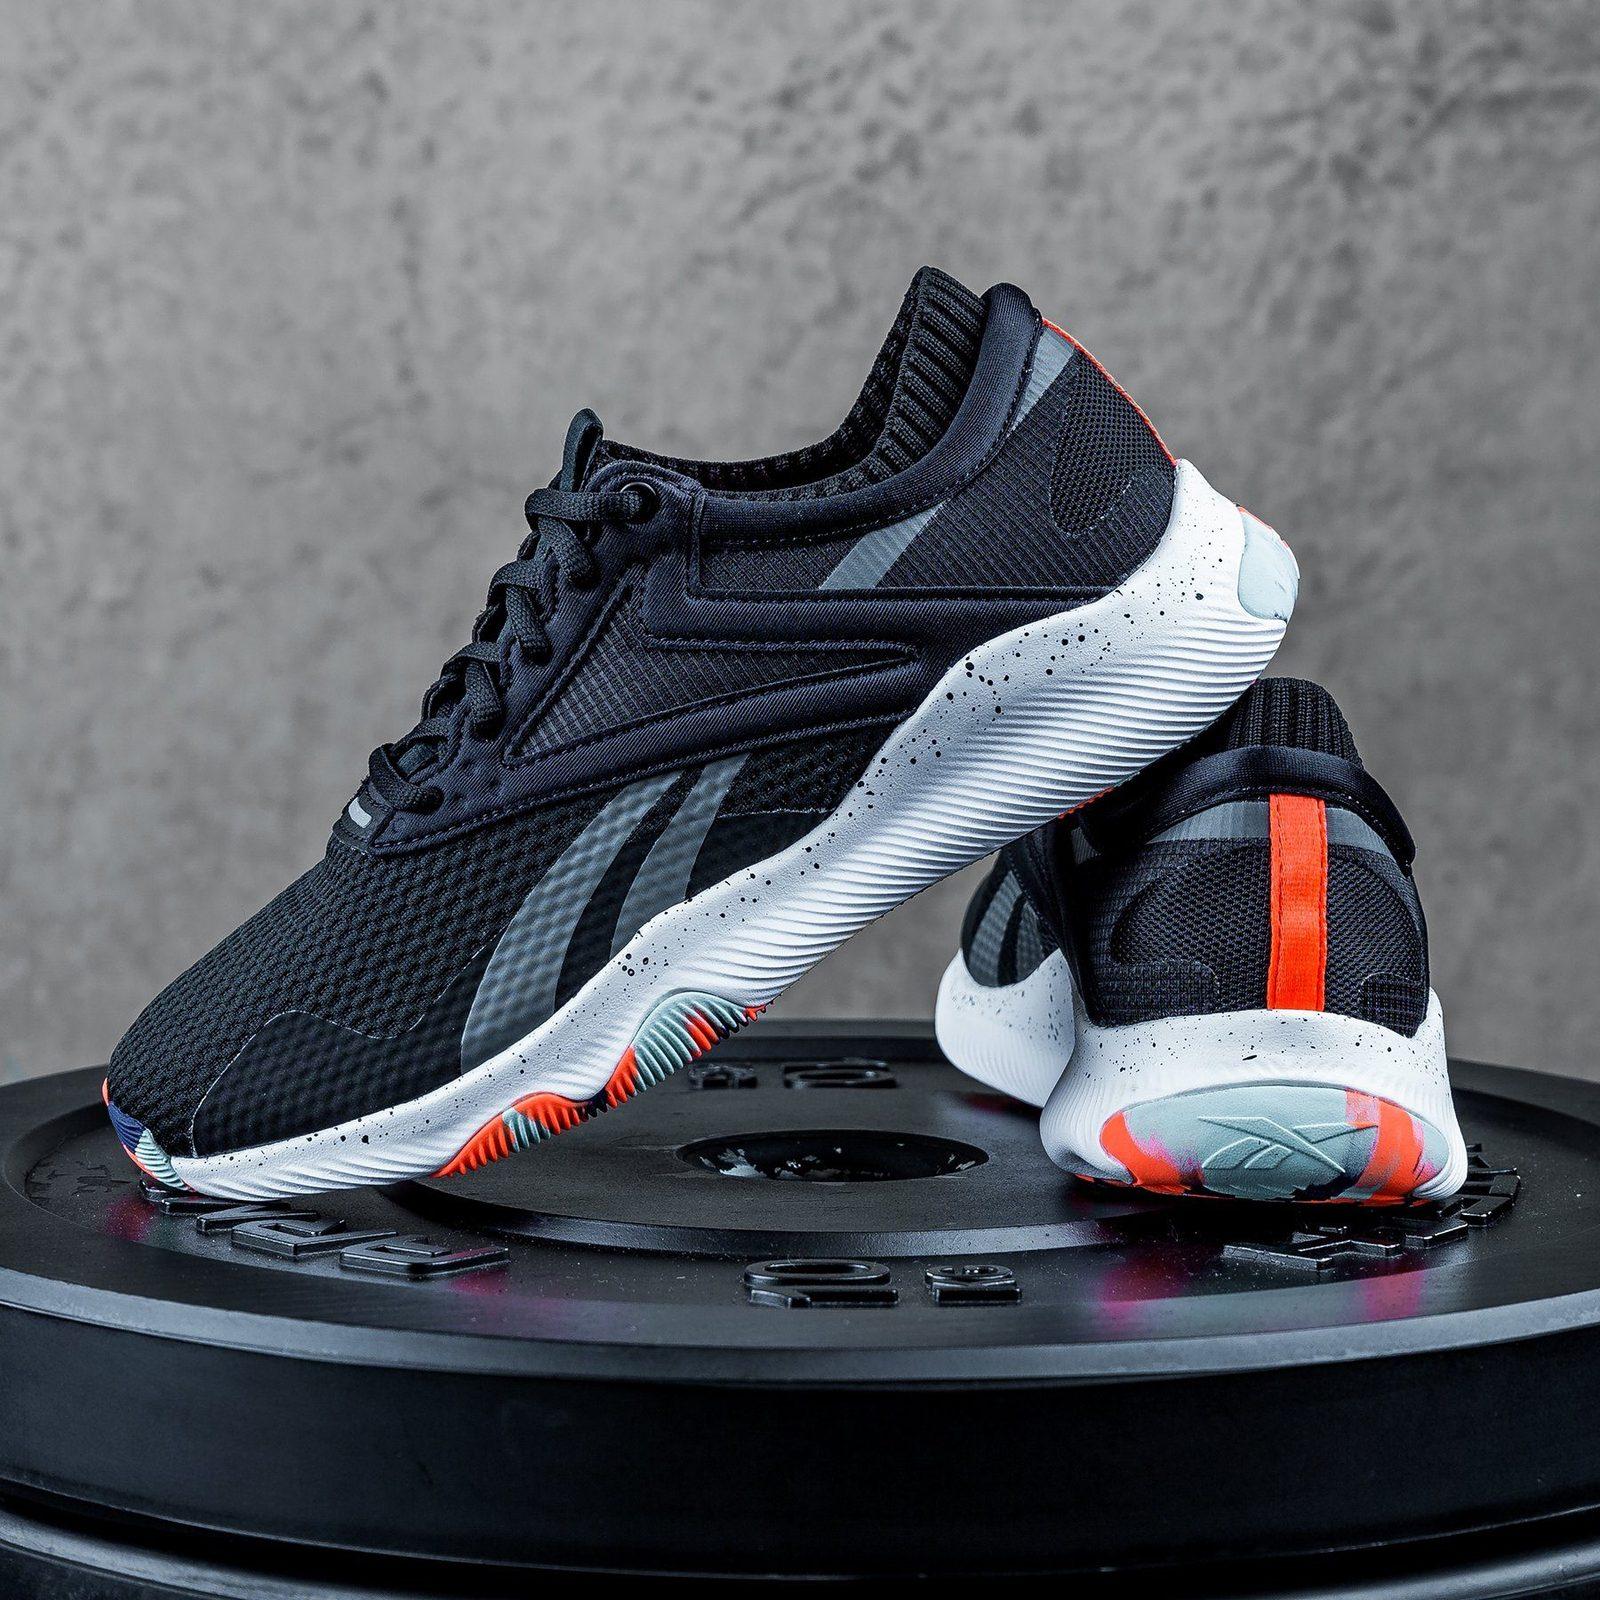 Reebok-HIIT-Training-Shoe-2 +80 Most Inspiring Workout Shoes Ideas for Women